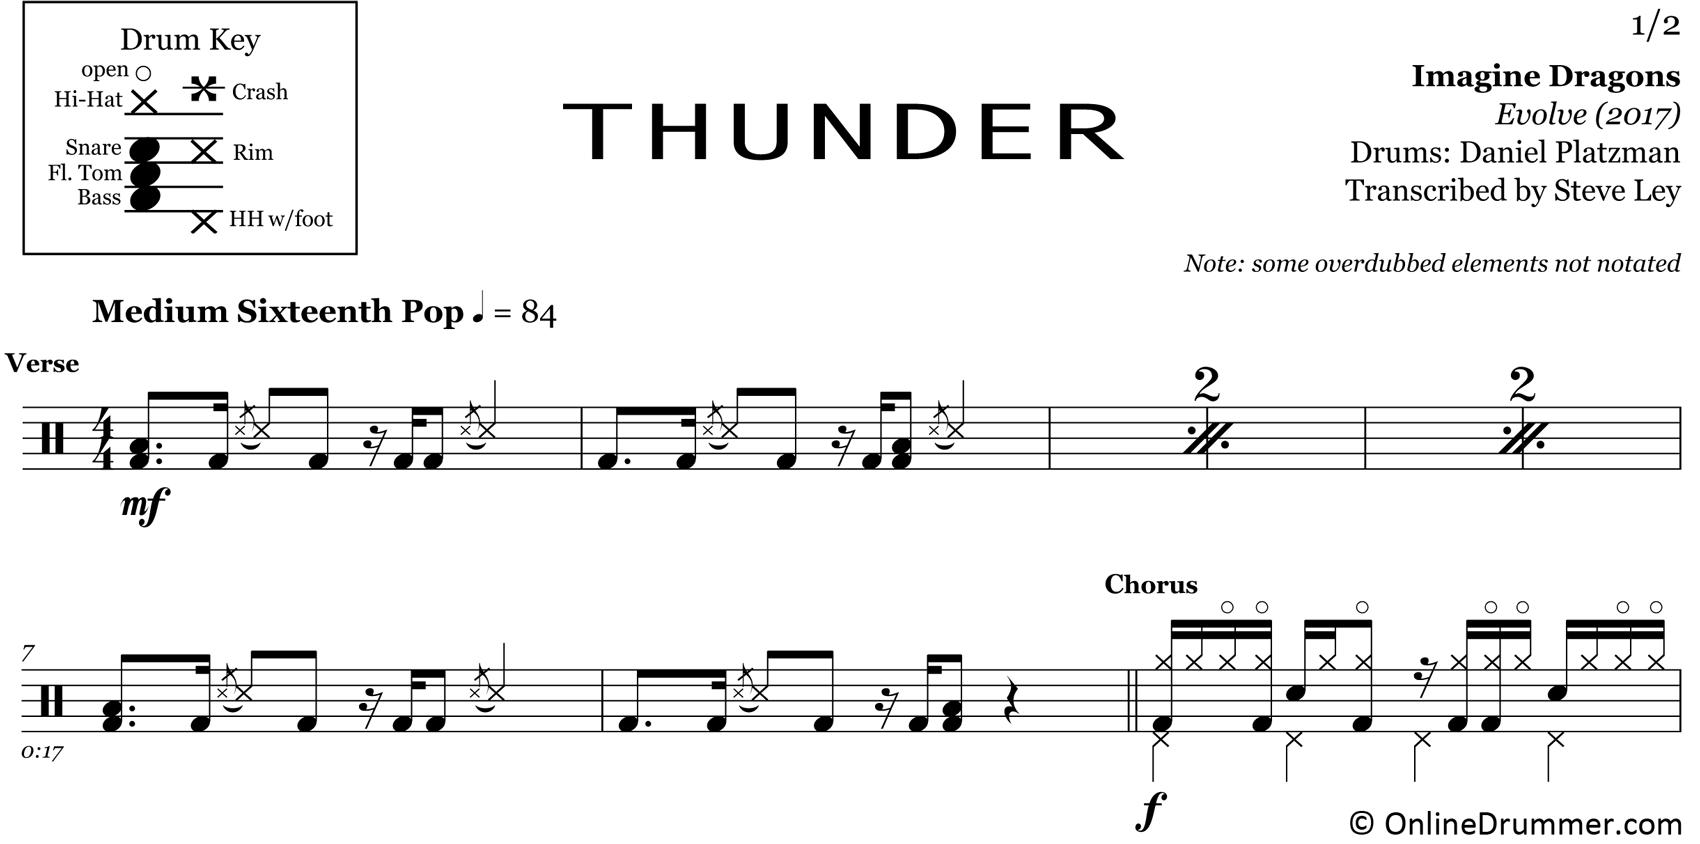 Thunder - Imagine Dragons - Drum Sheet Music